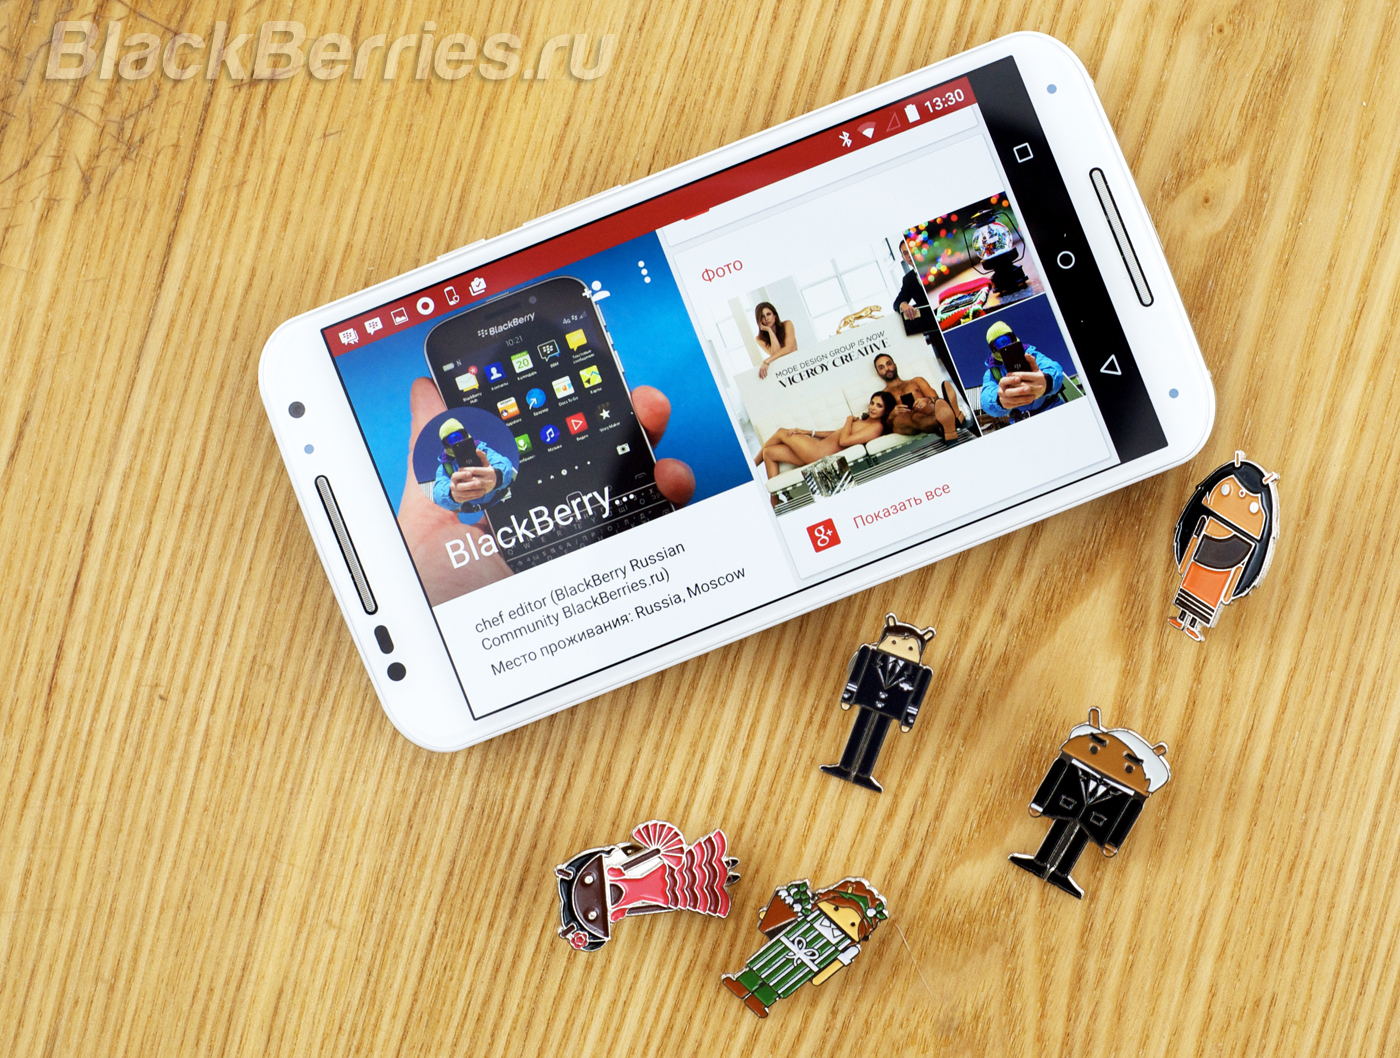 BlackBerry-Motorola-Hg10-4